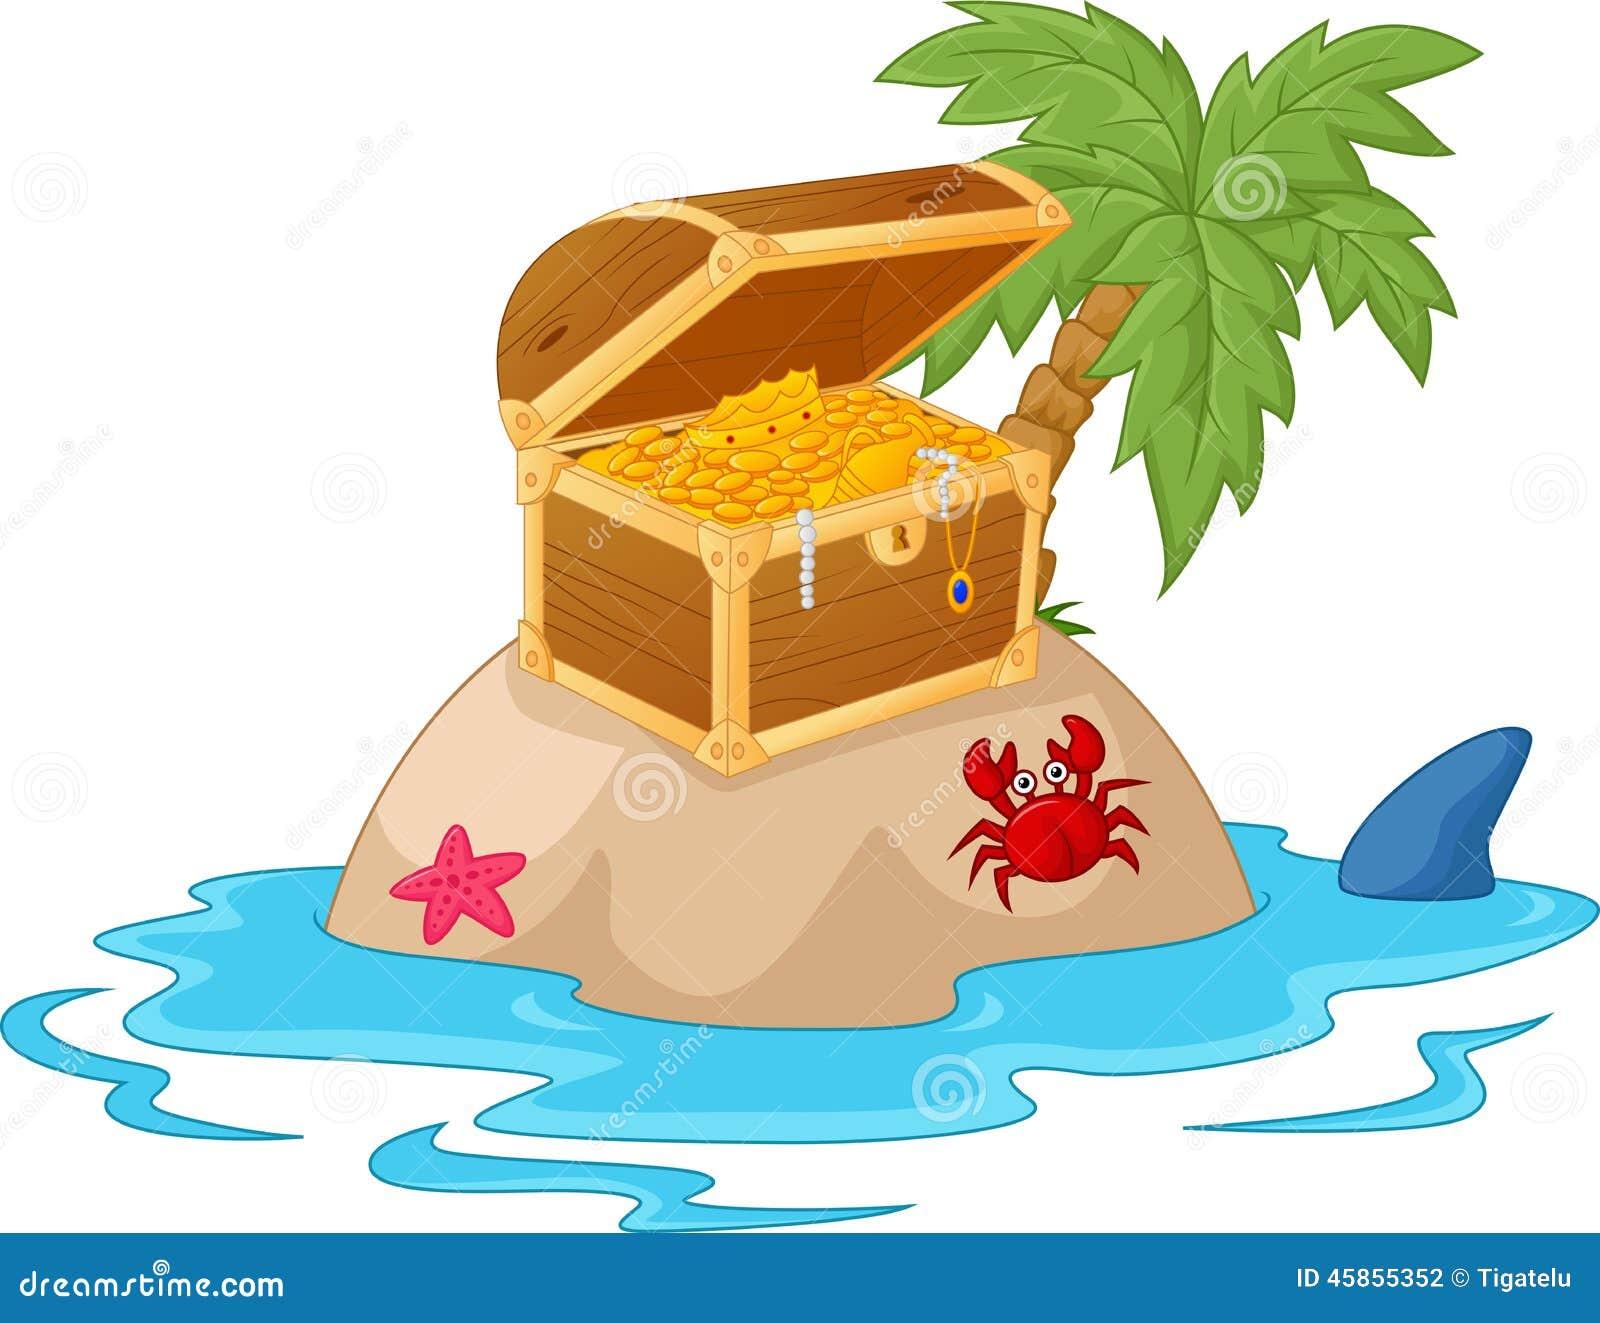 Treasure Island Cartoon Stock Vector - Image: 45855352